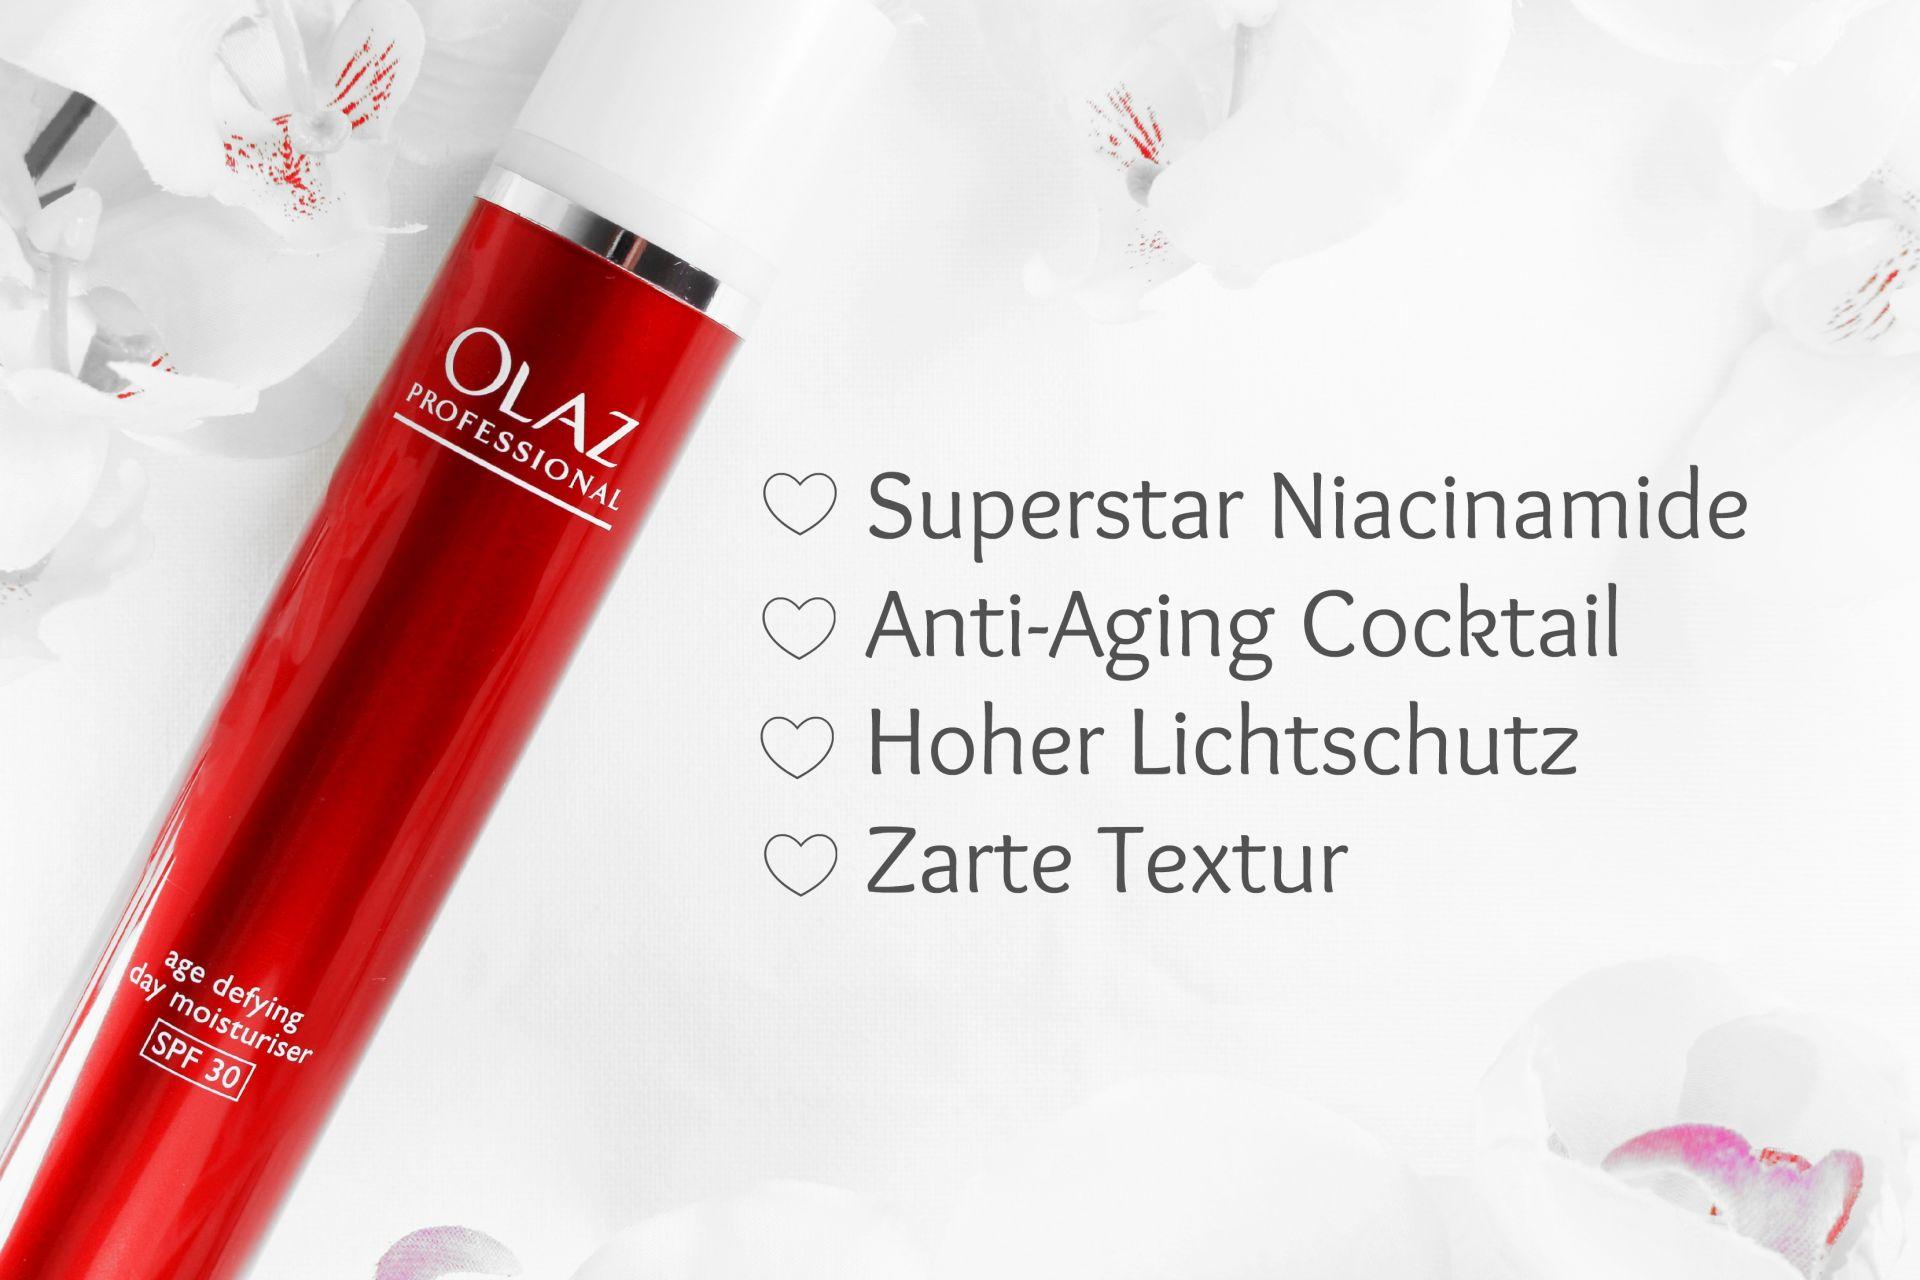 Olaz Professional Anti-Ageing Tagescreme mit LSF 30, Olaz Regenerist Luminous, Olaz Niacinamide, Super Twins Annalena und Magdalena